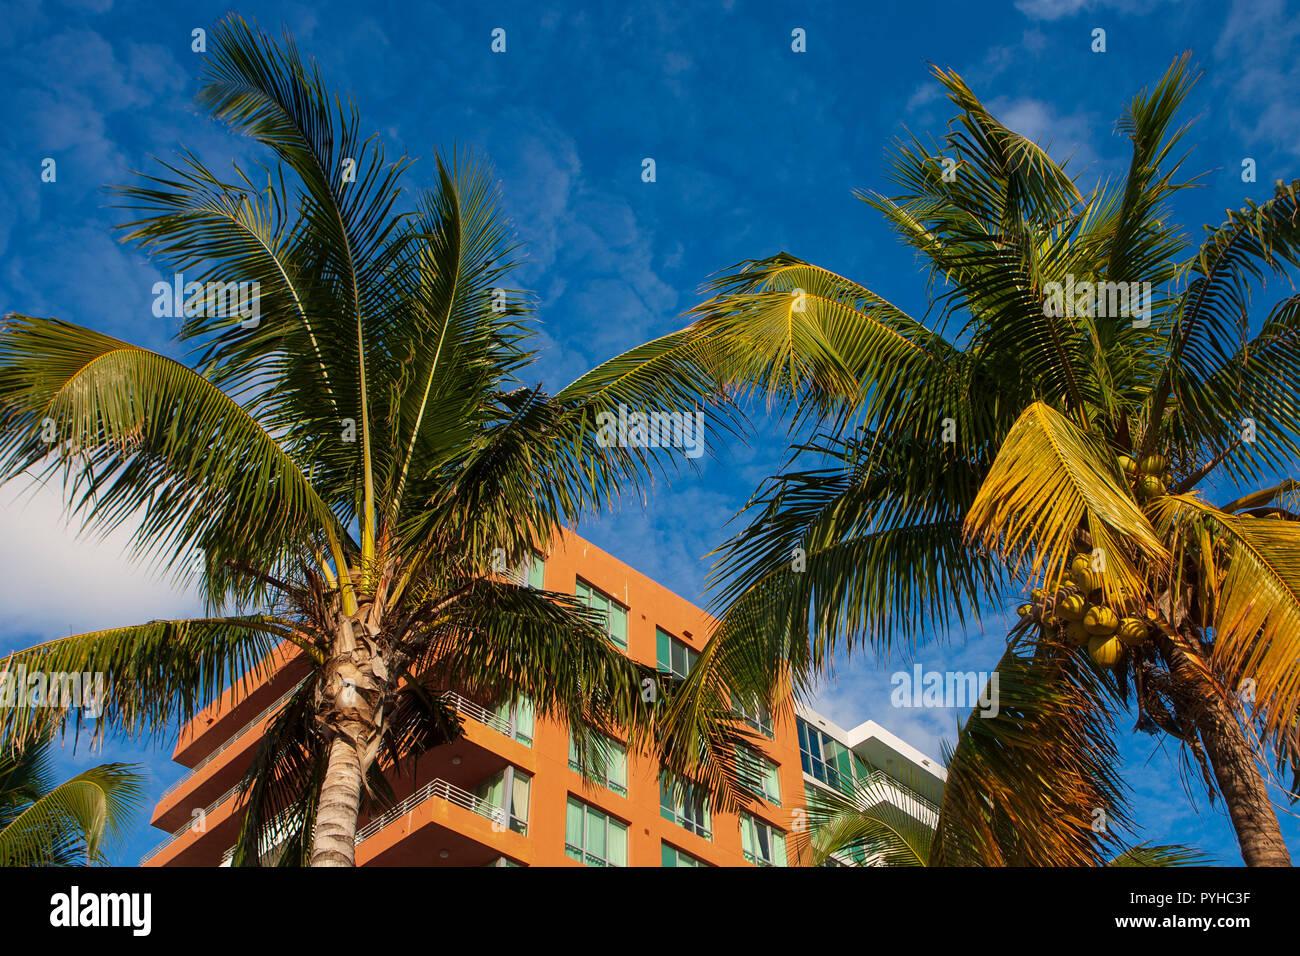 Art Deco style apartment building, Miami Beach, Florida, USA. - Stock Image